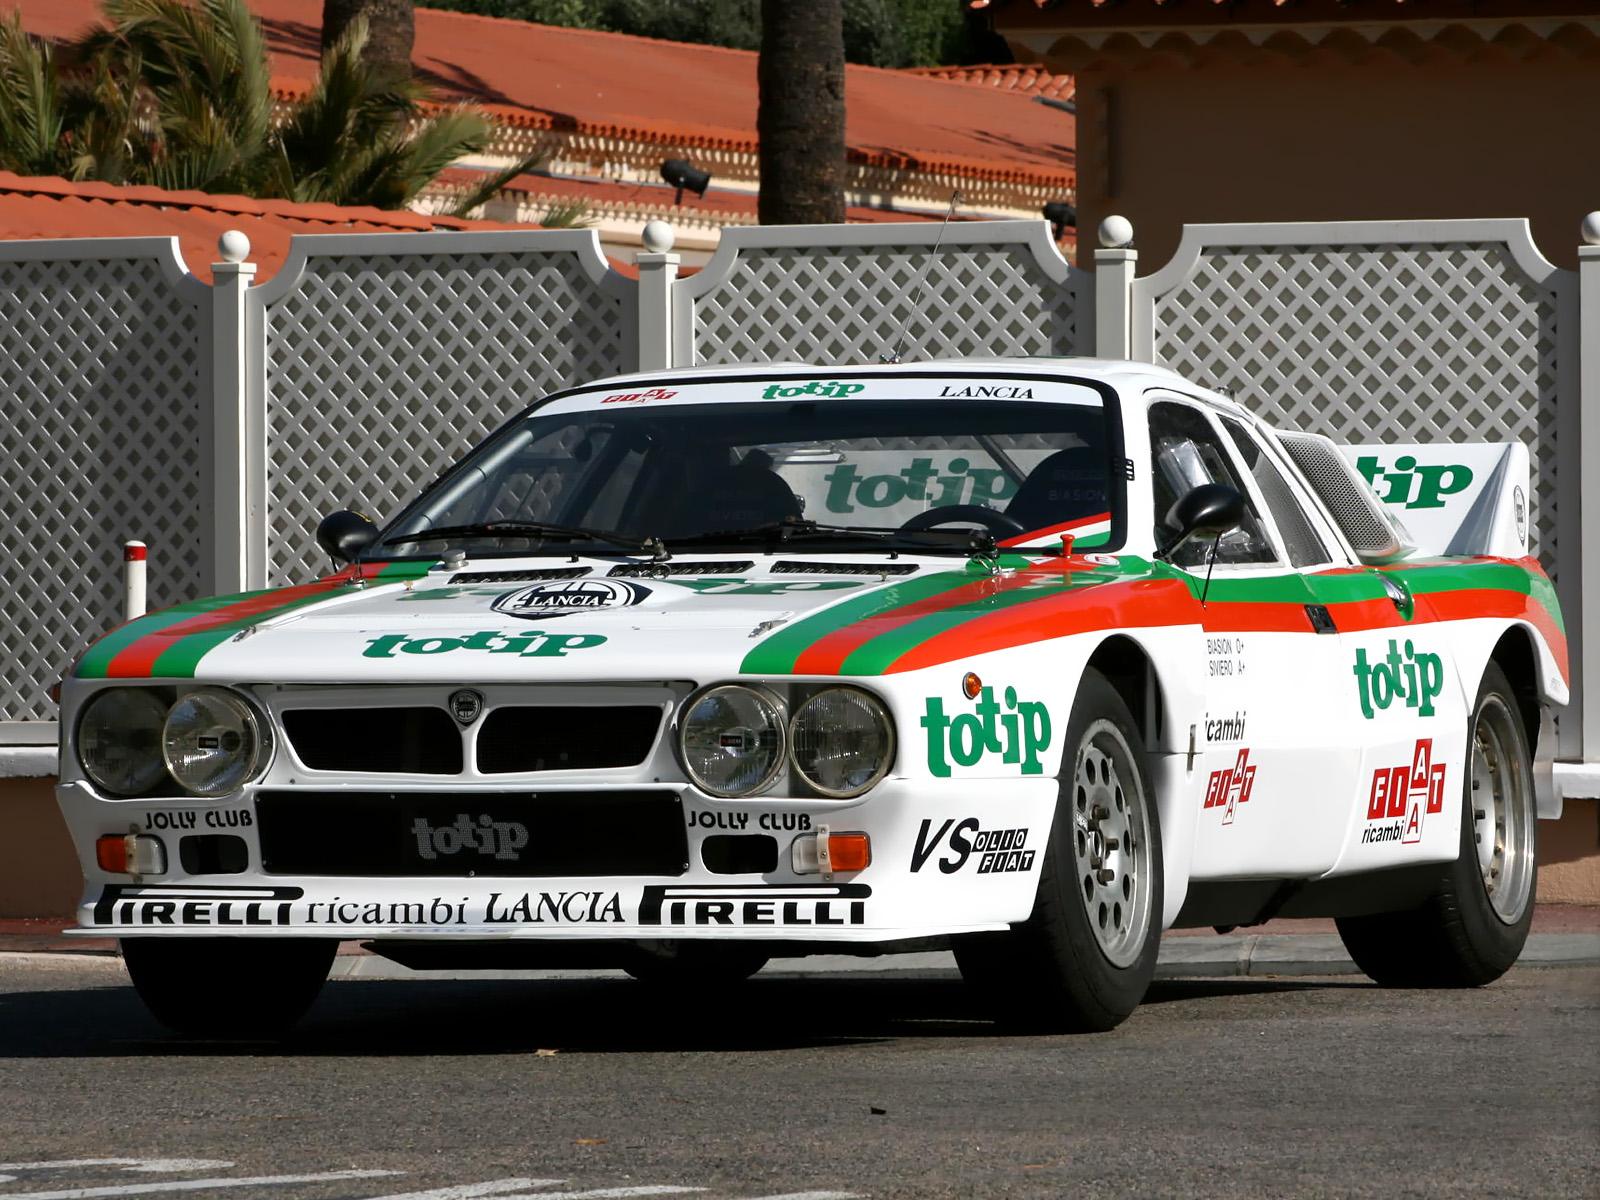 1983 Lancia Rally 037 Group B race racing h wallpaper background 1600x1200